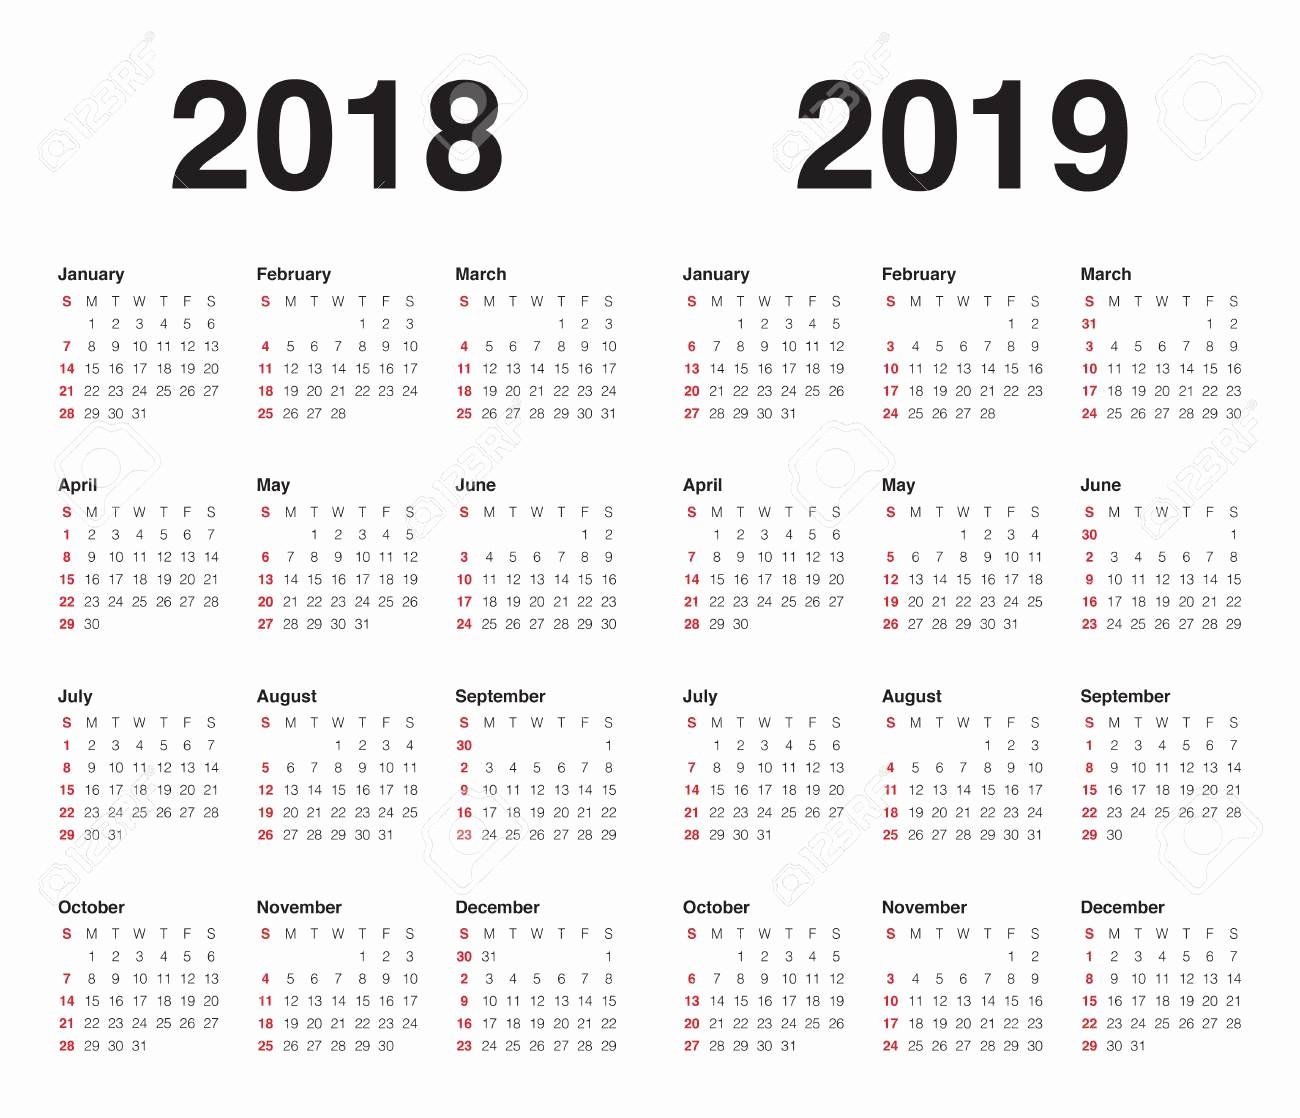 Printable Calendar 2018 and 2019 Best Of Free Calendar for 2018 2019